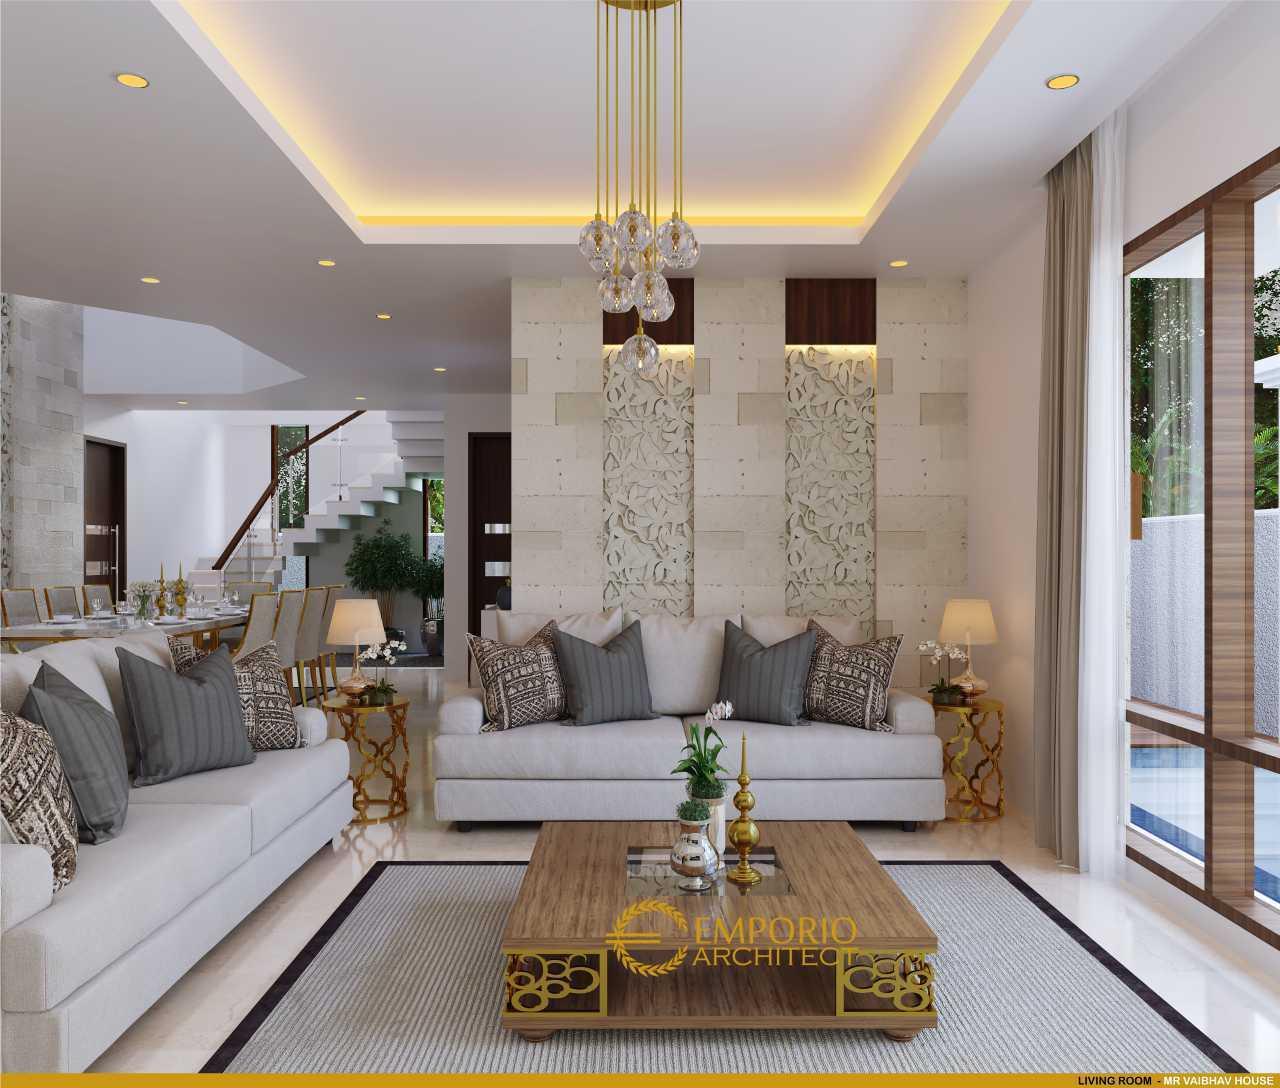 Emporio Architect Jasa Arsitek India Desain Rumah Villa Bali 2 Lantai 724 @ India India India Emporio-Architect-Jasa-Arsitek-India-Desain-Rumah-Villa-Bali-2-Lantai-724-India   93942